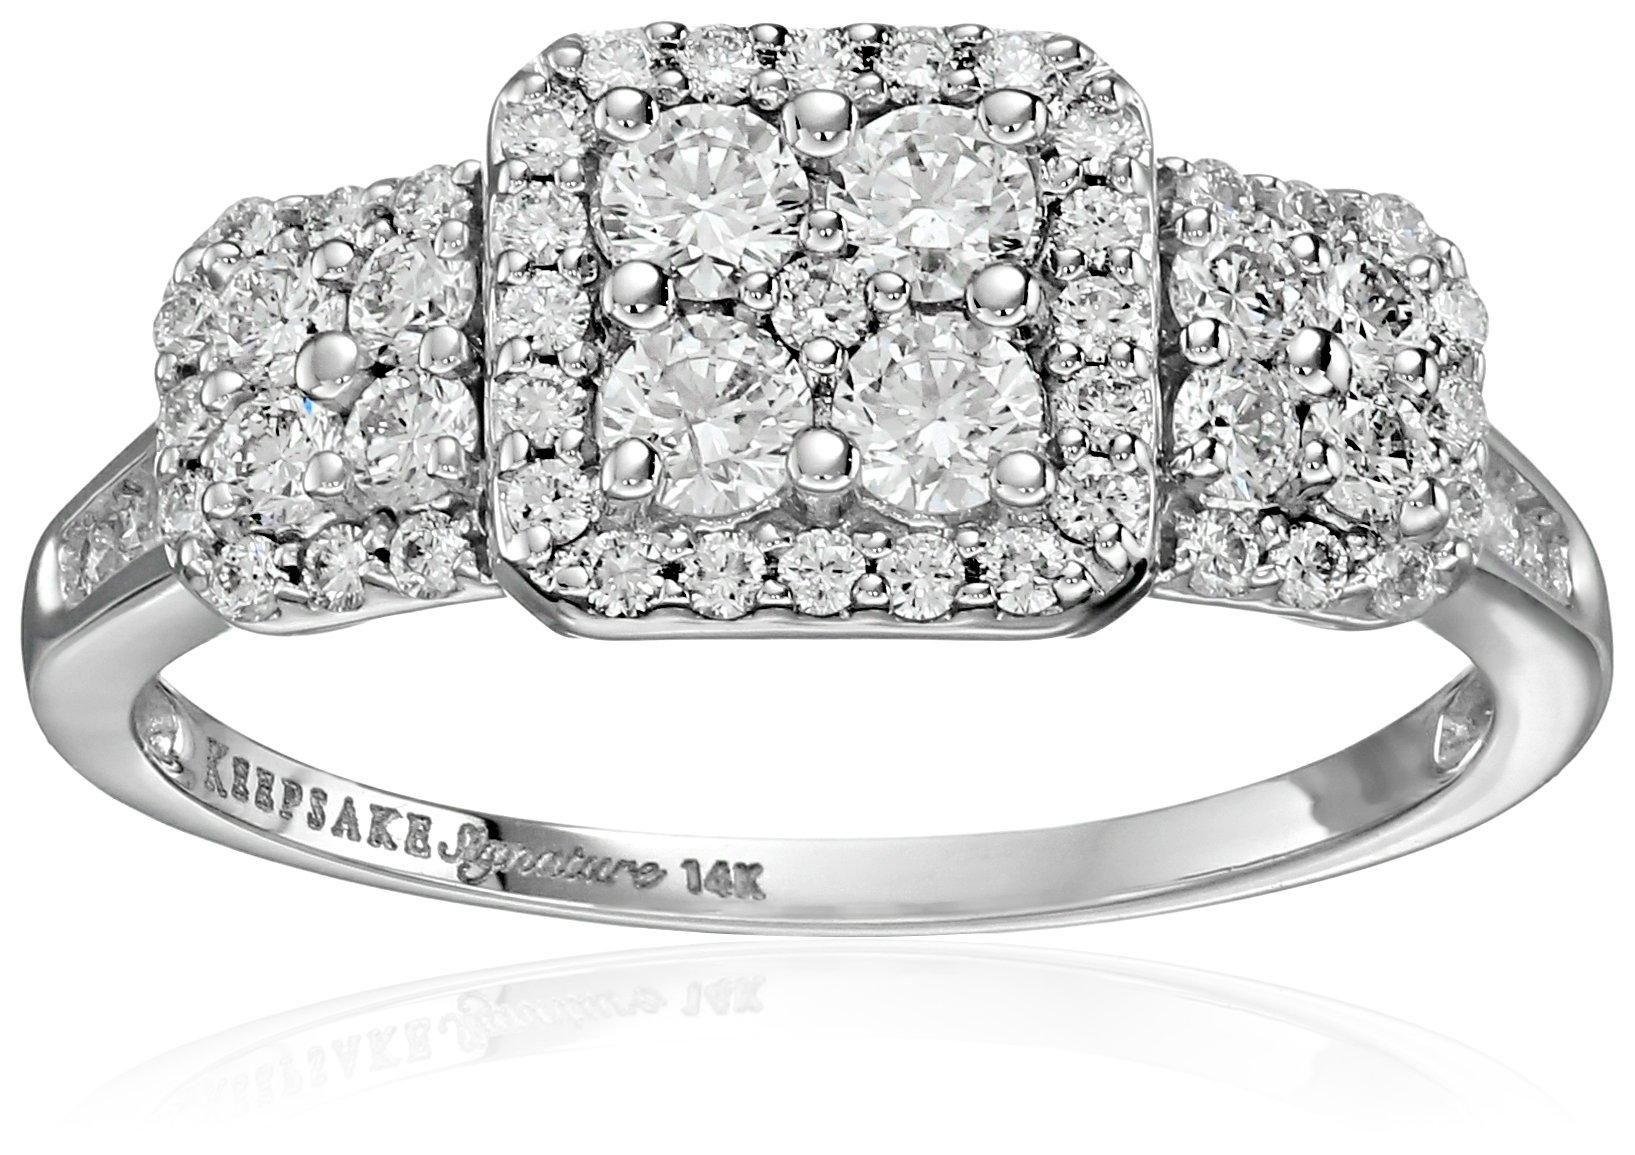 Keepsake Signature 14k White Gold Diamond Three-Stone Engagement Ring (1cttw, H-I Color, I1 Clarity), Size 7